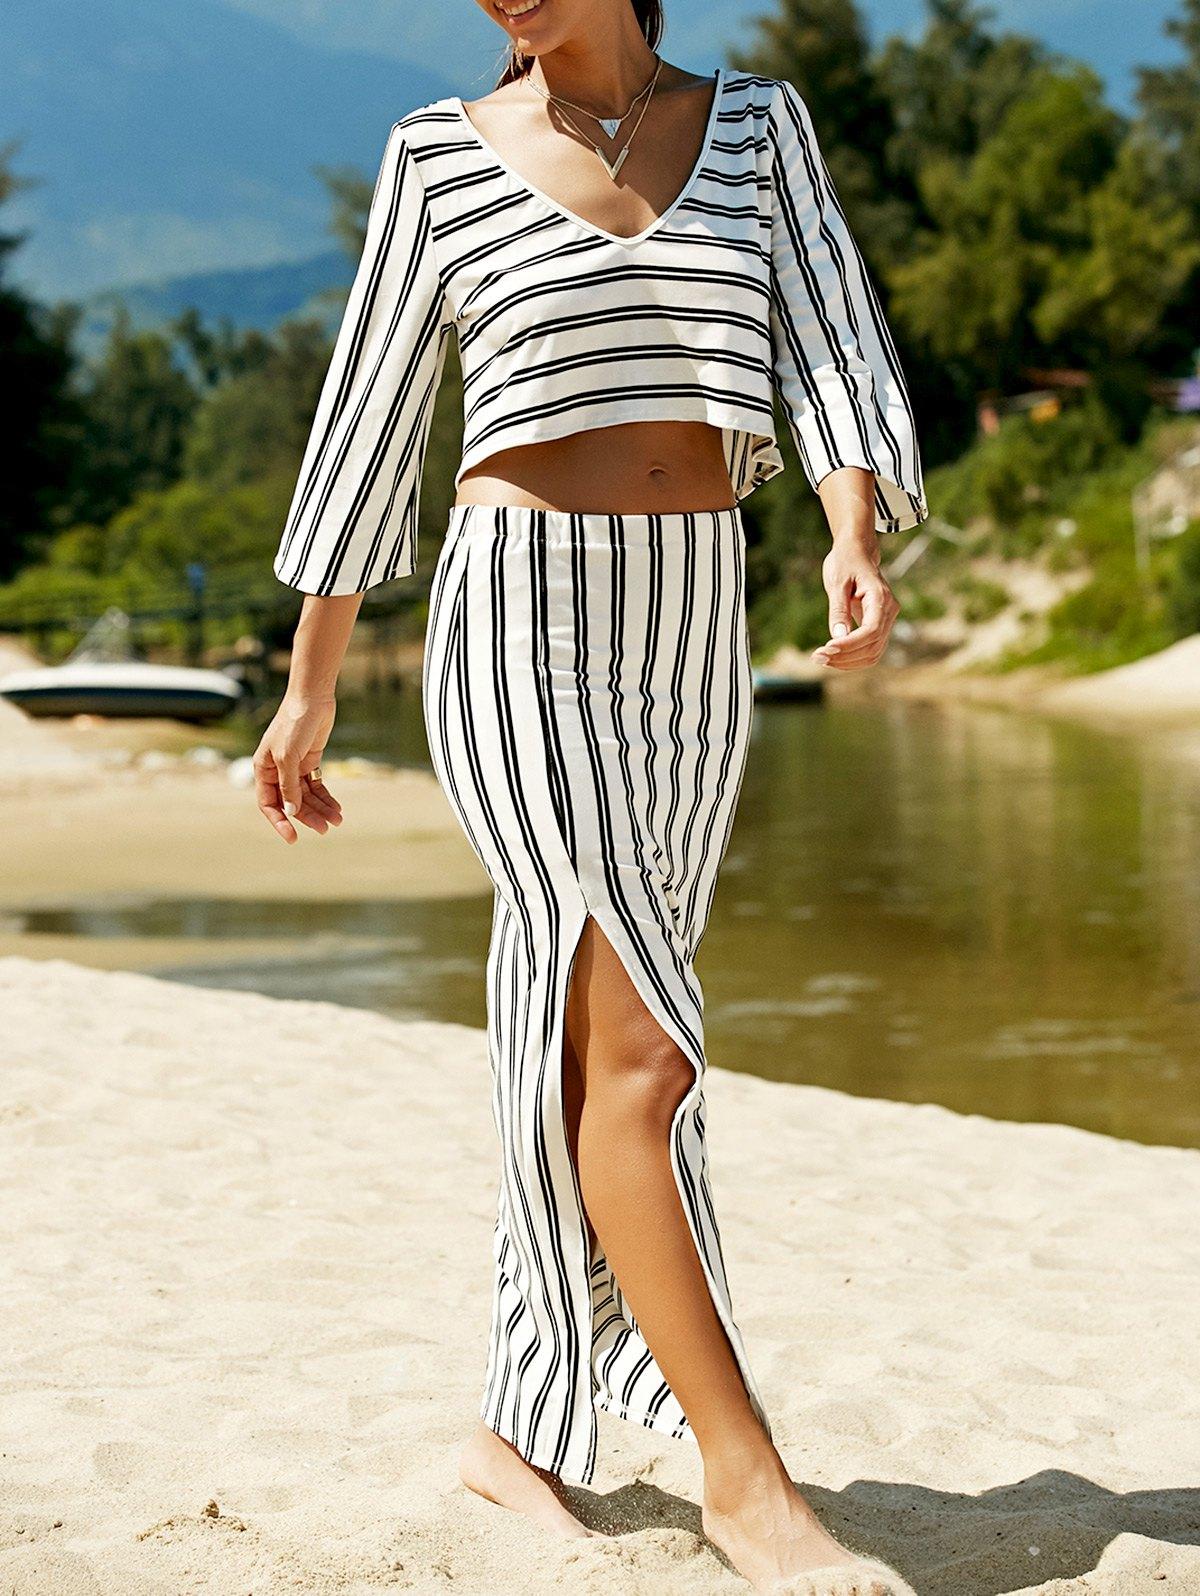 V-Neck Striped T-Shirt and High Slit Skirt Twinset